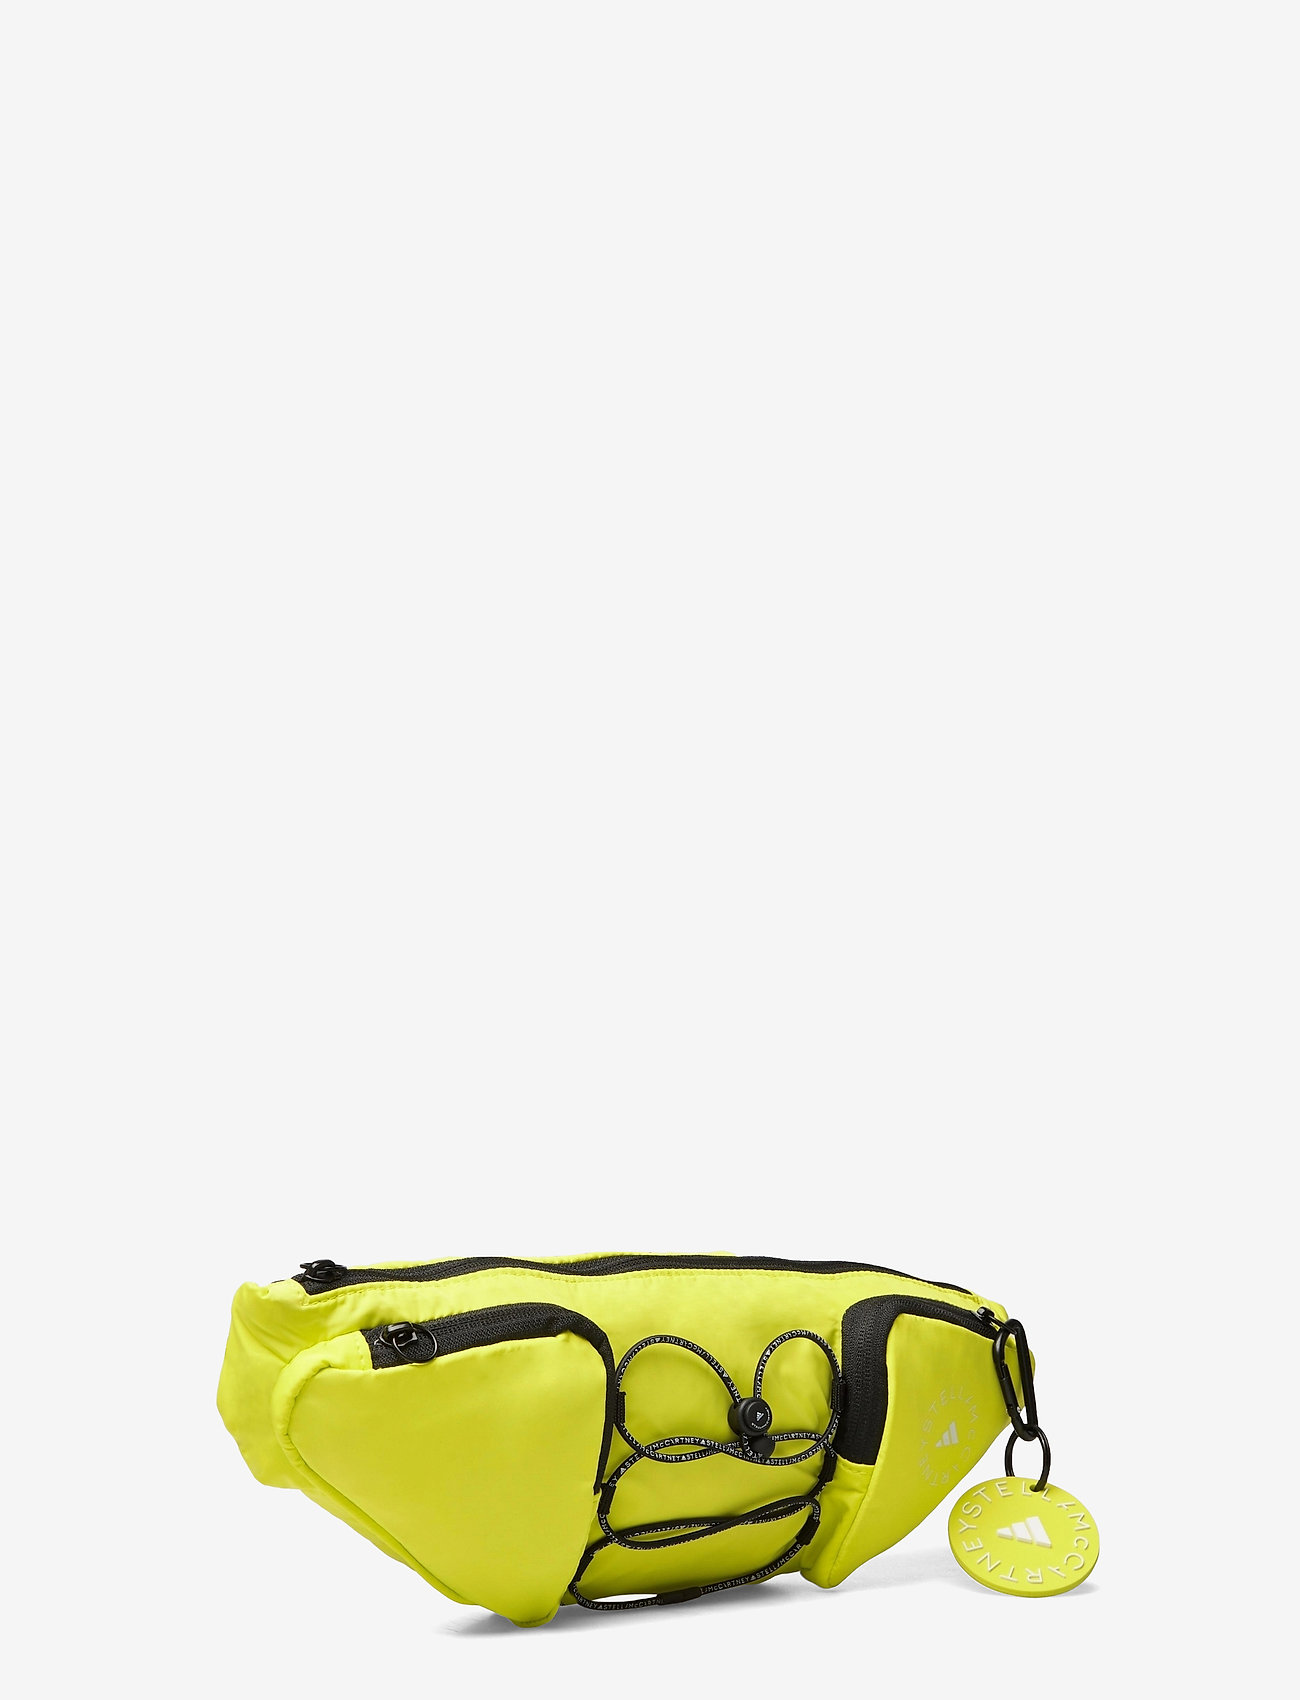 adidas by Stella McCartney - aSMC BUMBAG - belt bags - aciyel/black - 2